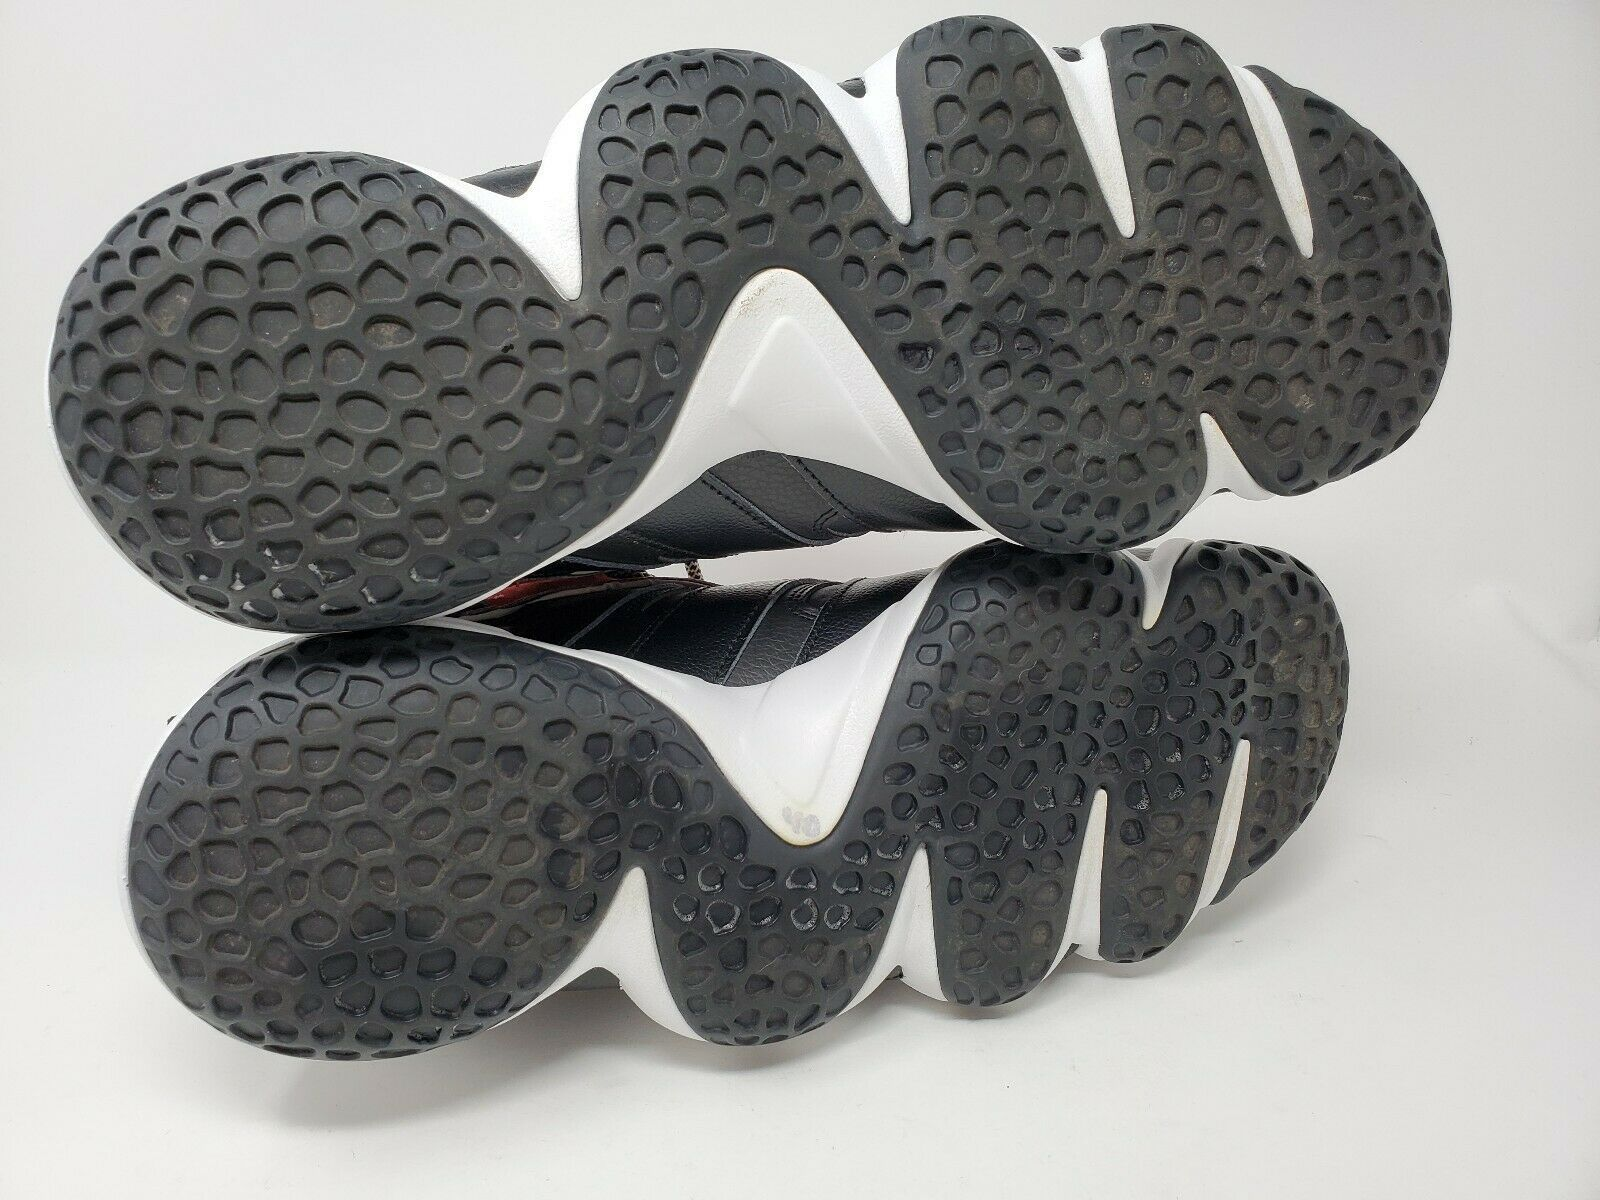 Adidas EQT Key Trainer Shoes Mens D73791 Sneakers Sz 12 Keyshawn Johnson